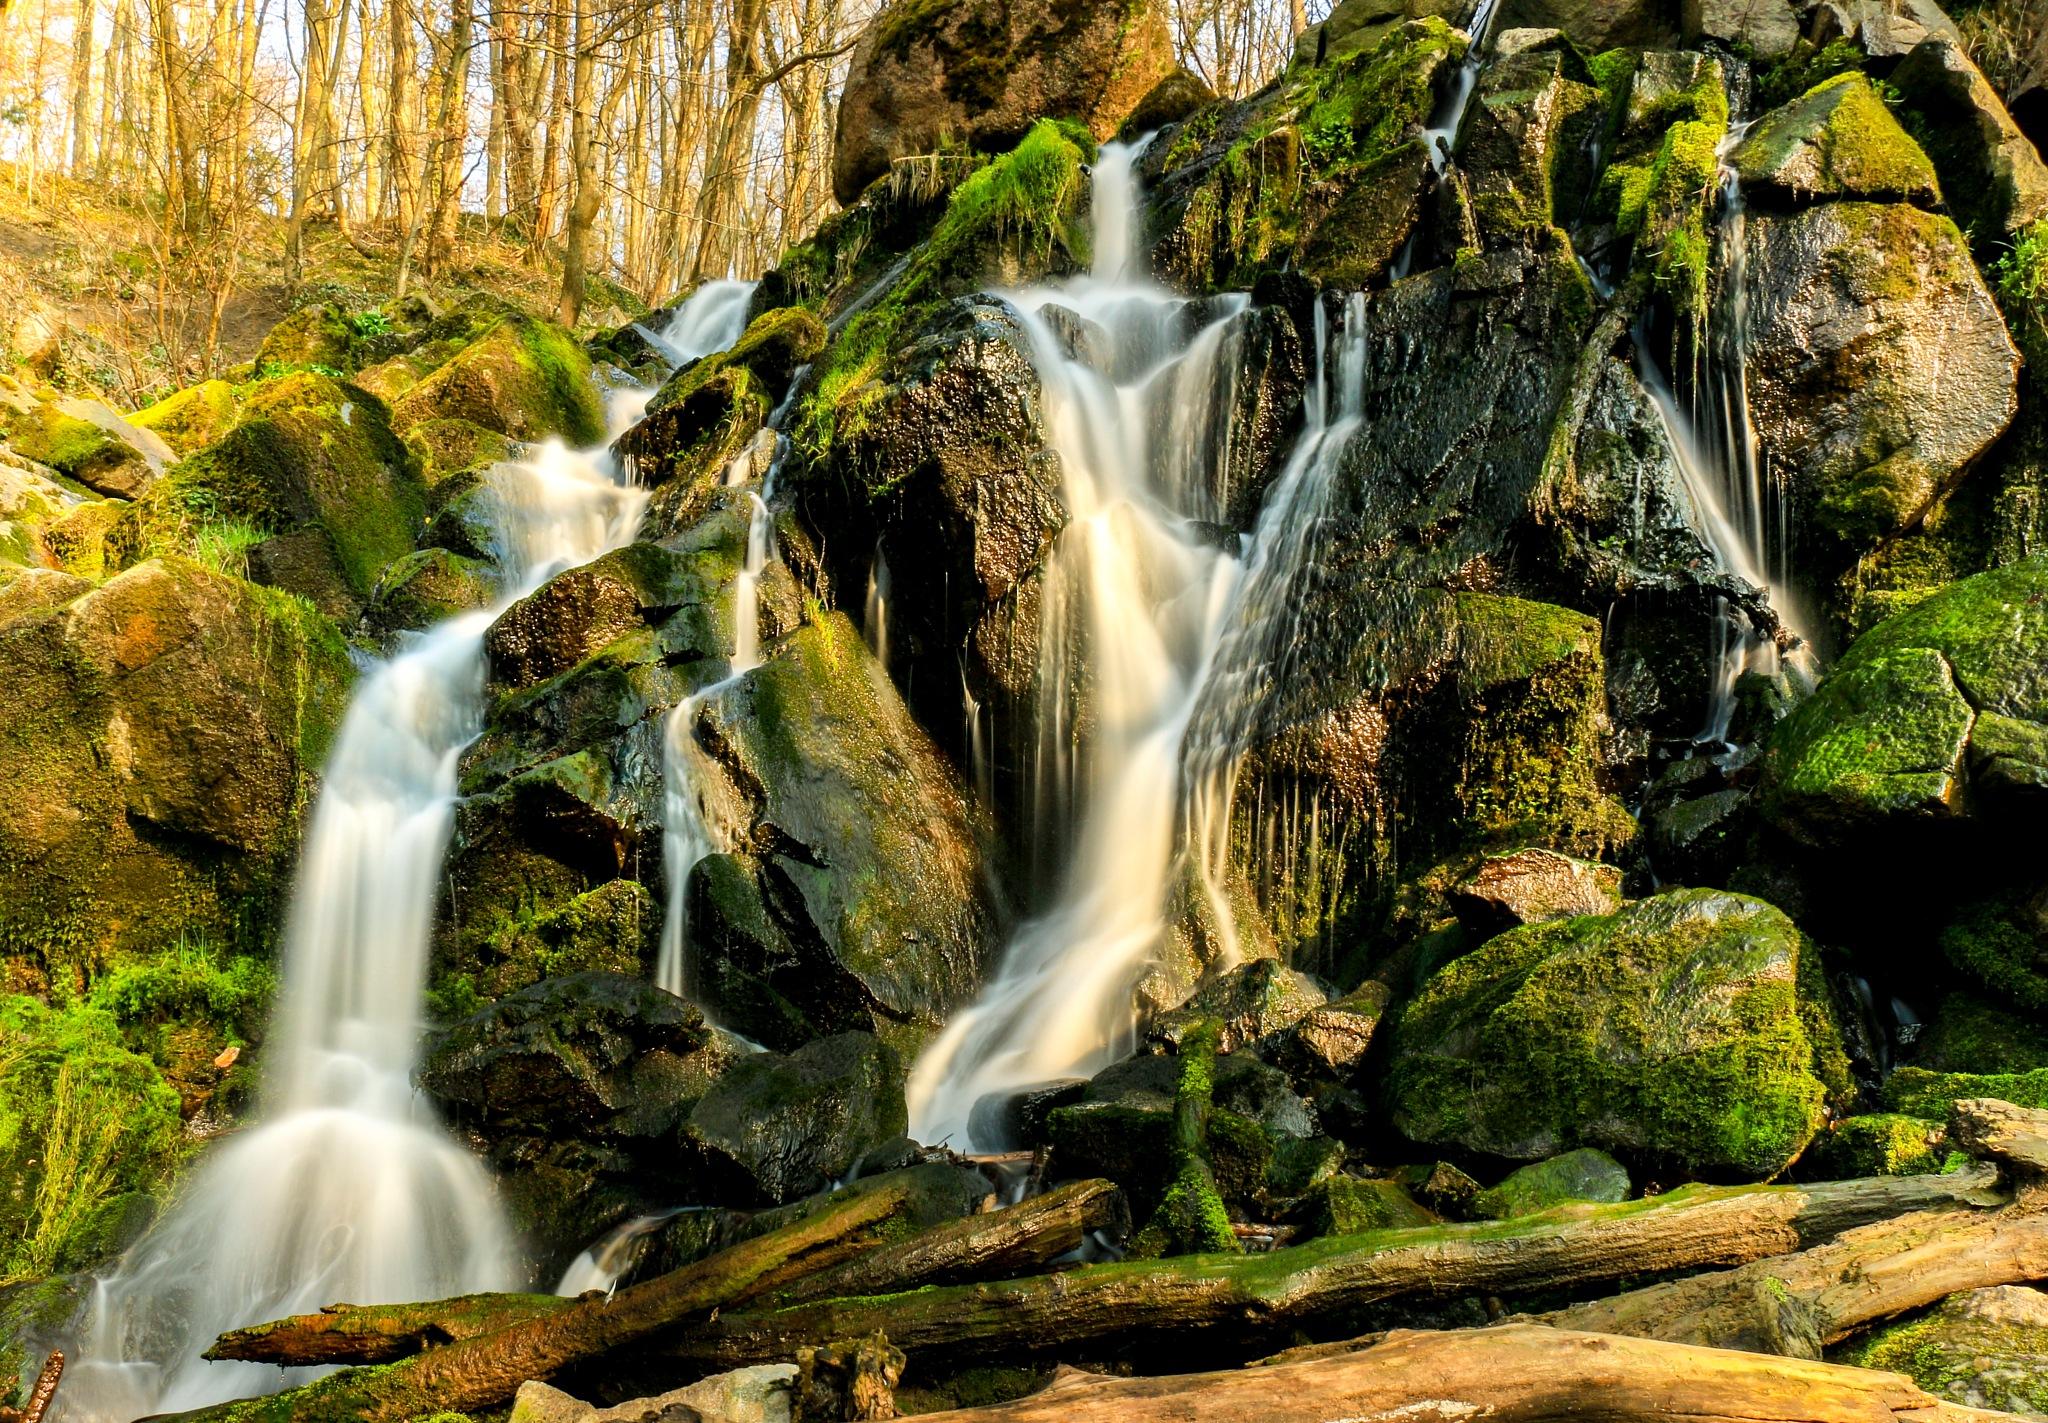 Small Waterfall by Karsten Larsen